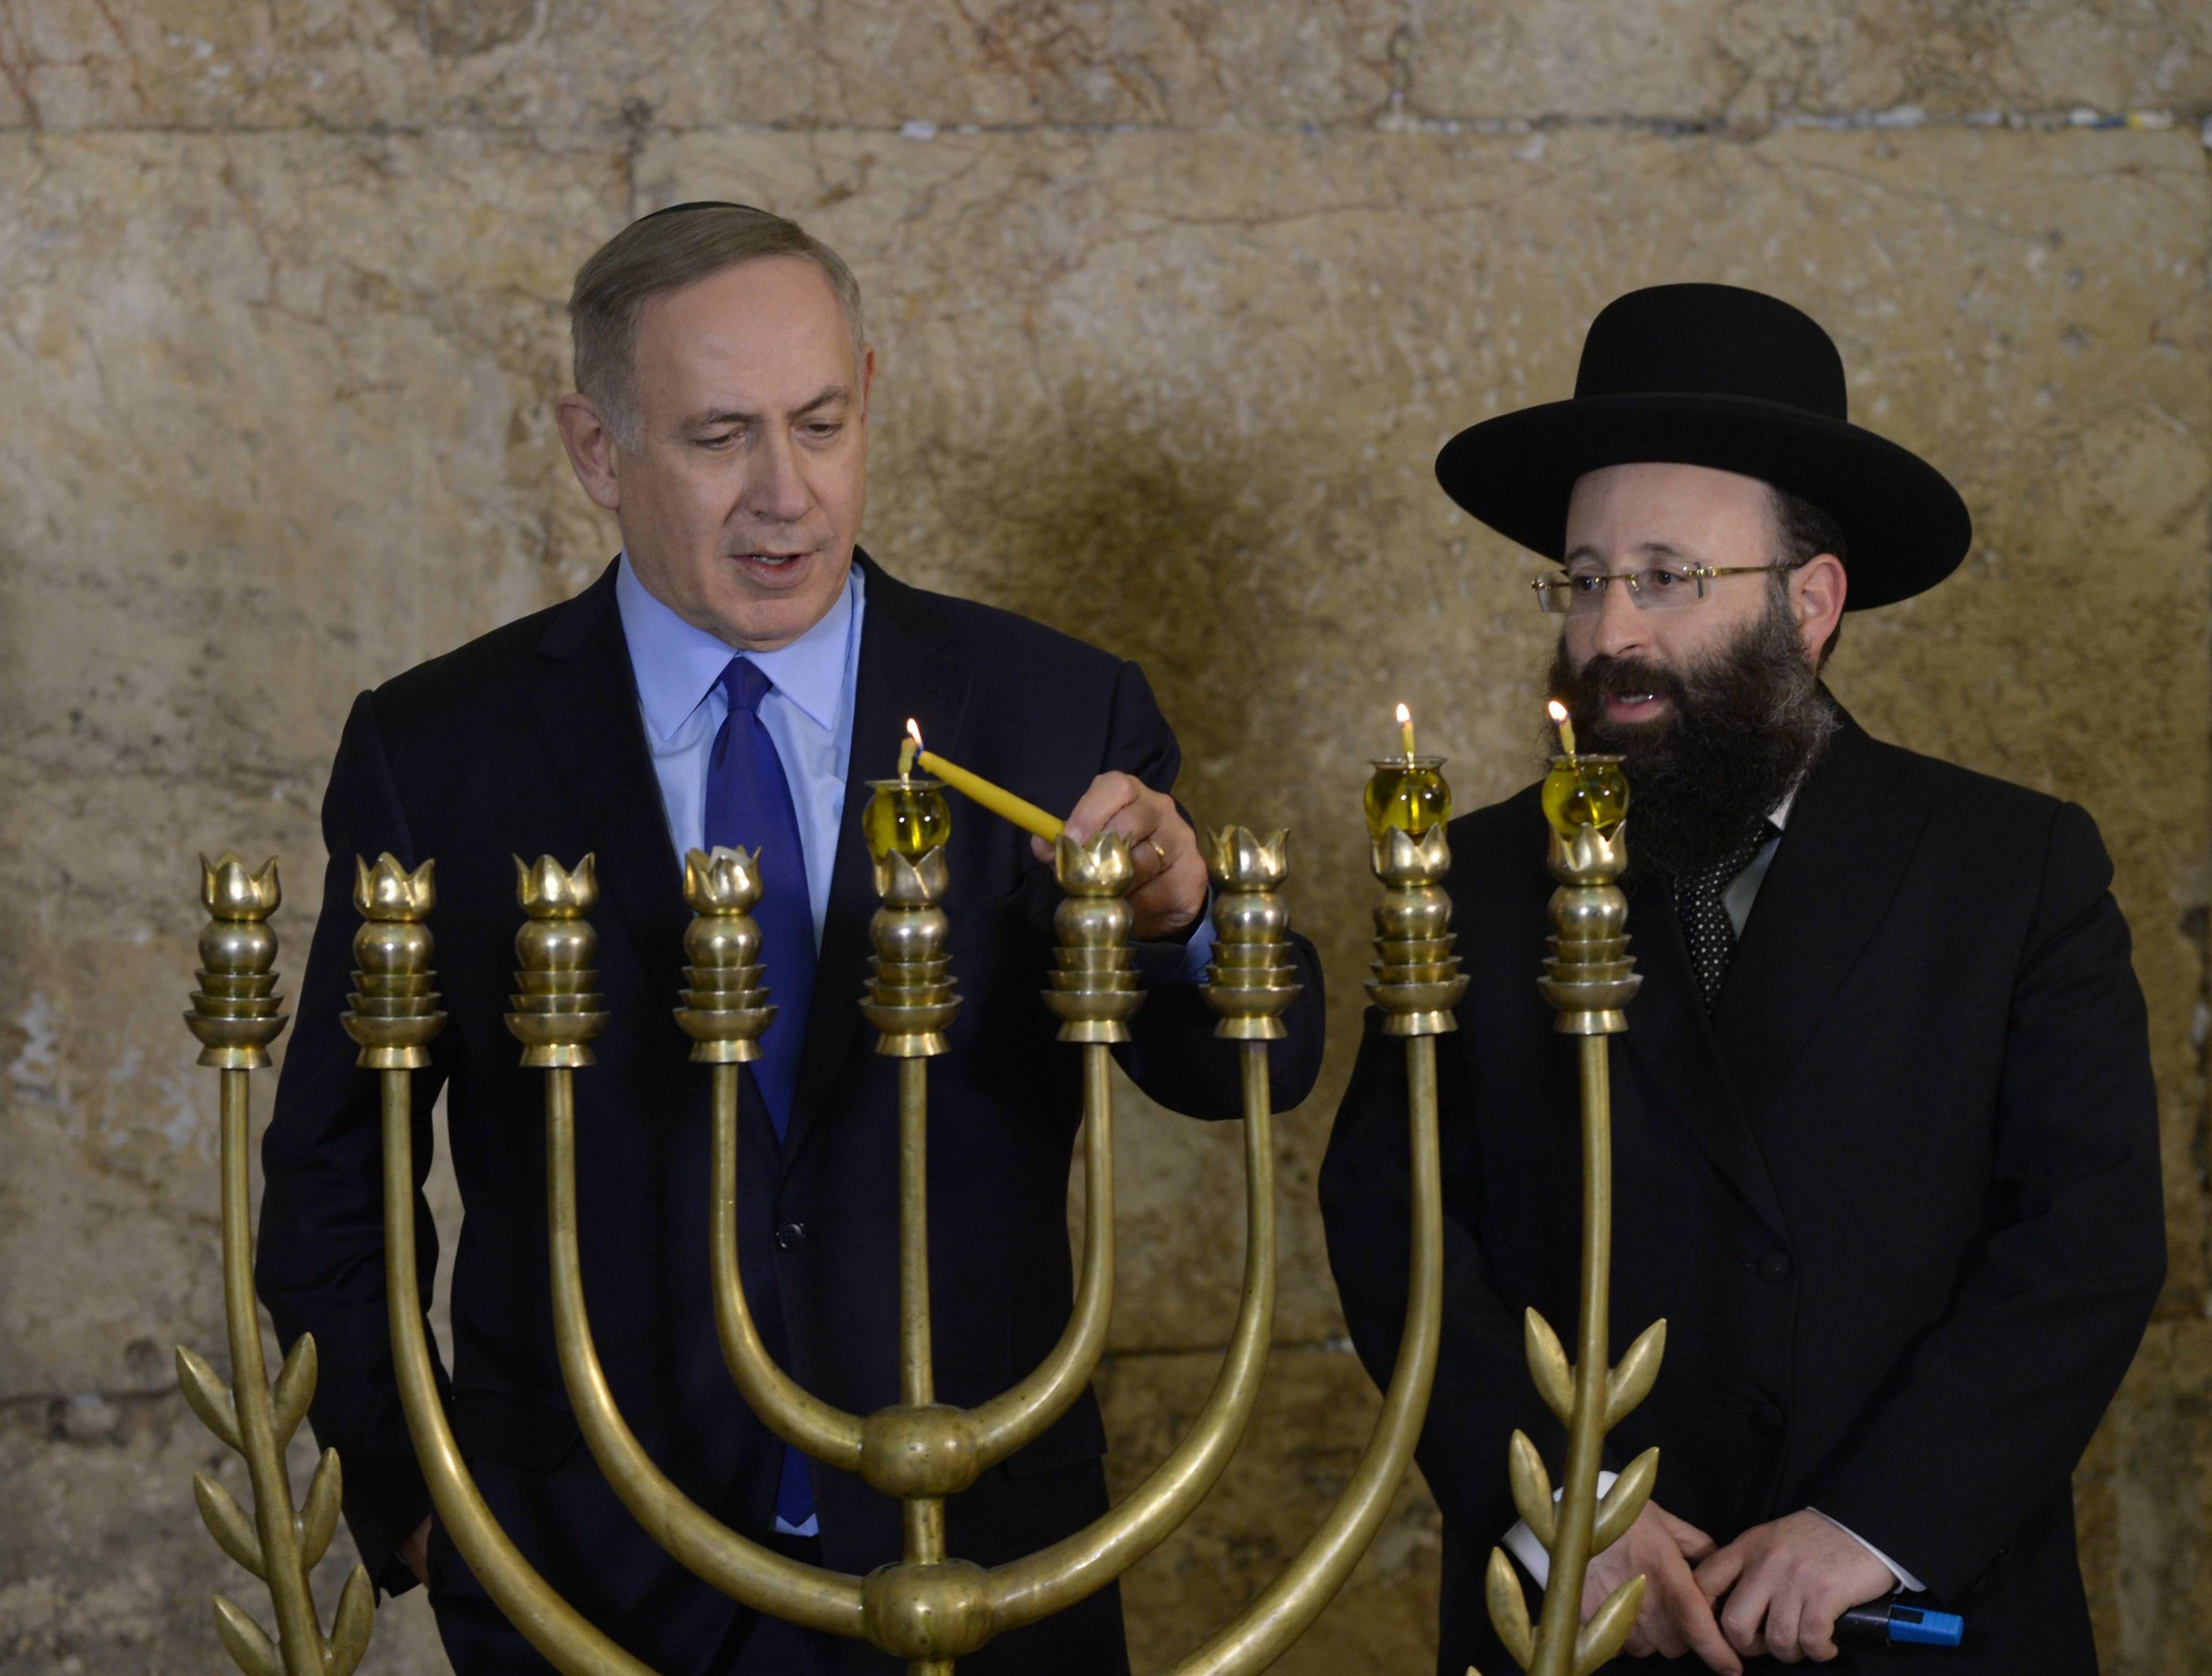 Israeli Prime Minister Benjamin Netanyahu lights the menorah for the second night of Hanukkah at the Western Wall in Jerusalem on December 25, 2016